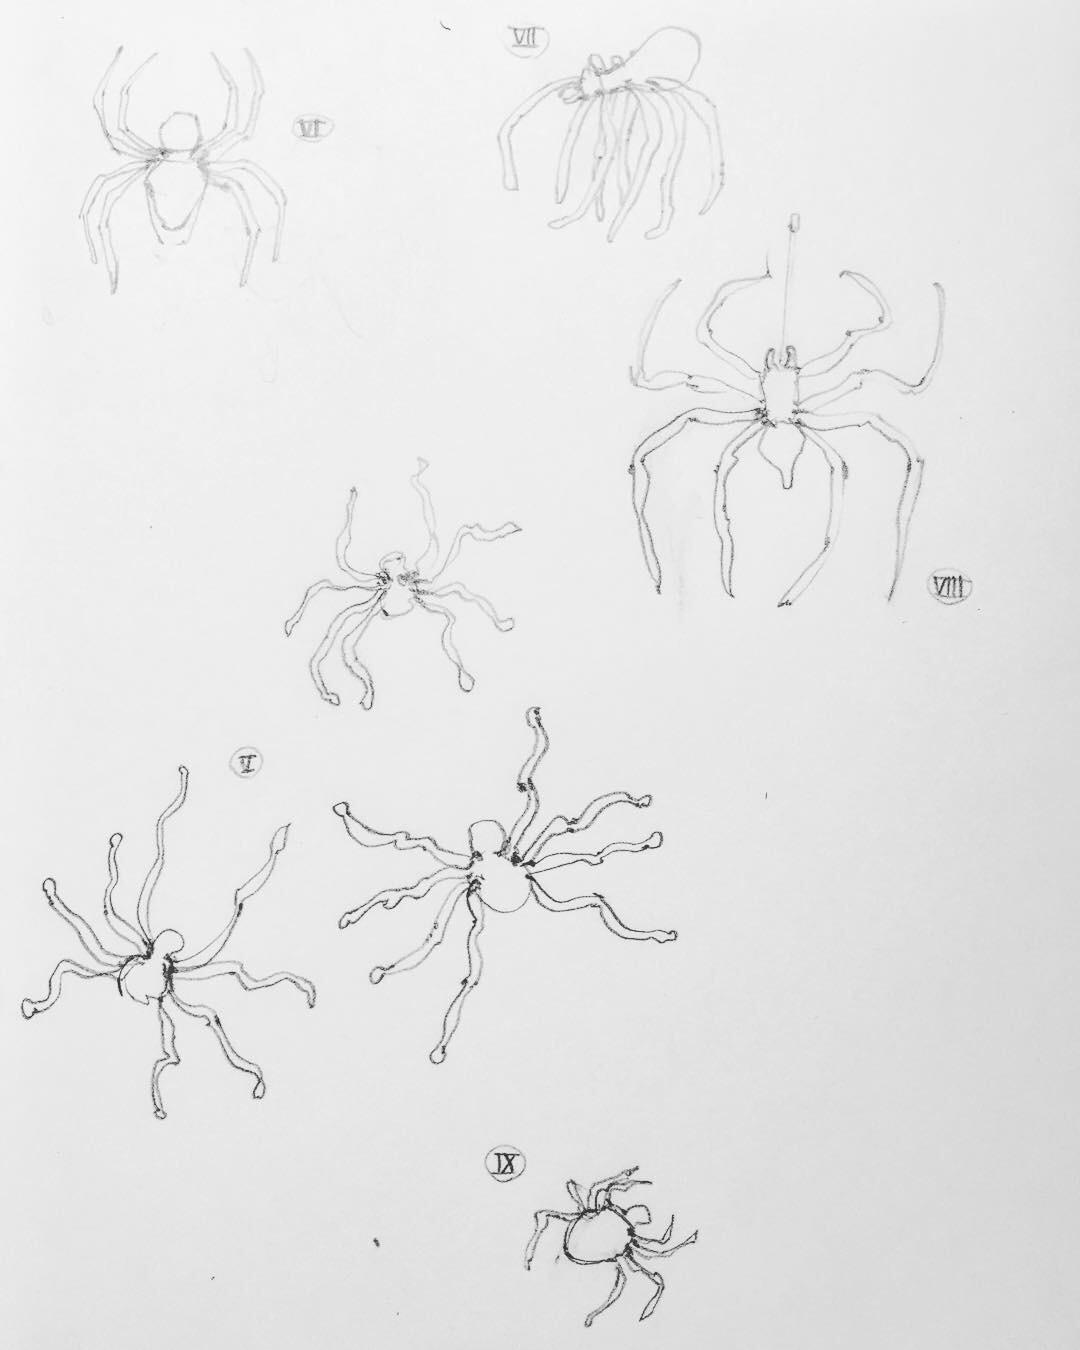 Spider pendant 1 sketch.JPG